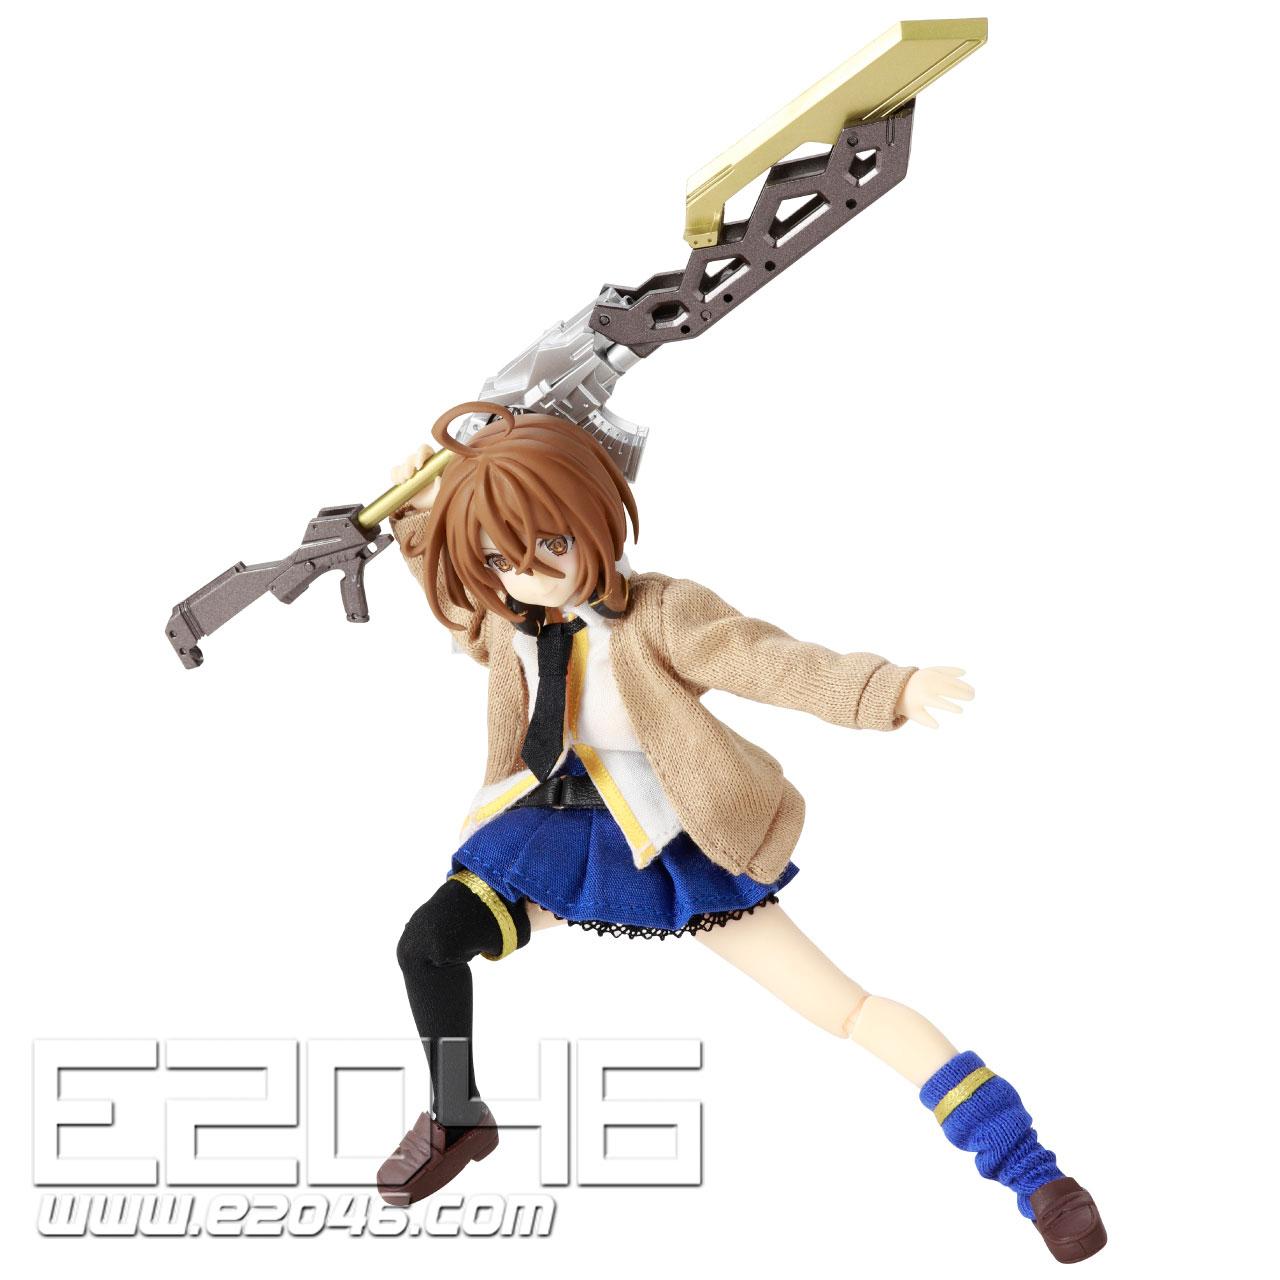 Kawamura Yuzuriha Pla Armor Version (PVC)